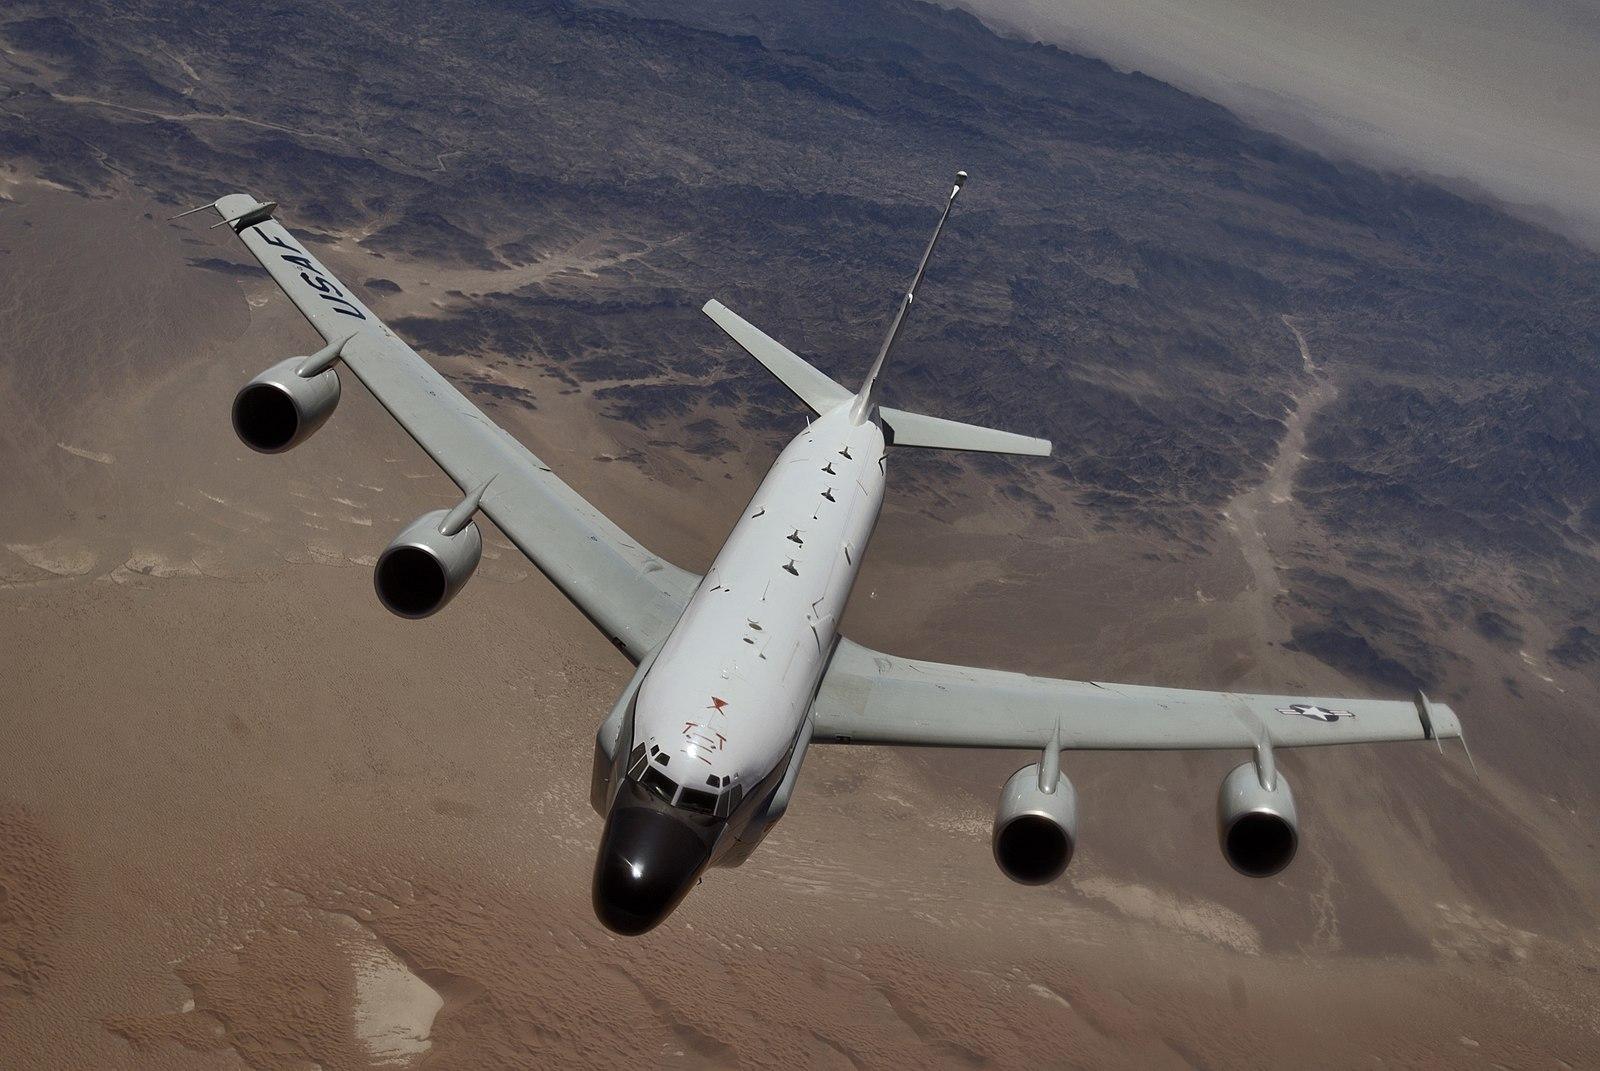 Russian Jet Cuts Off American Plane, U.S. Crew Lives In Danger — Pentagon Blasts 'Reckless' Russians